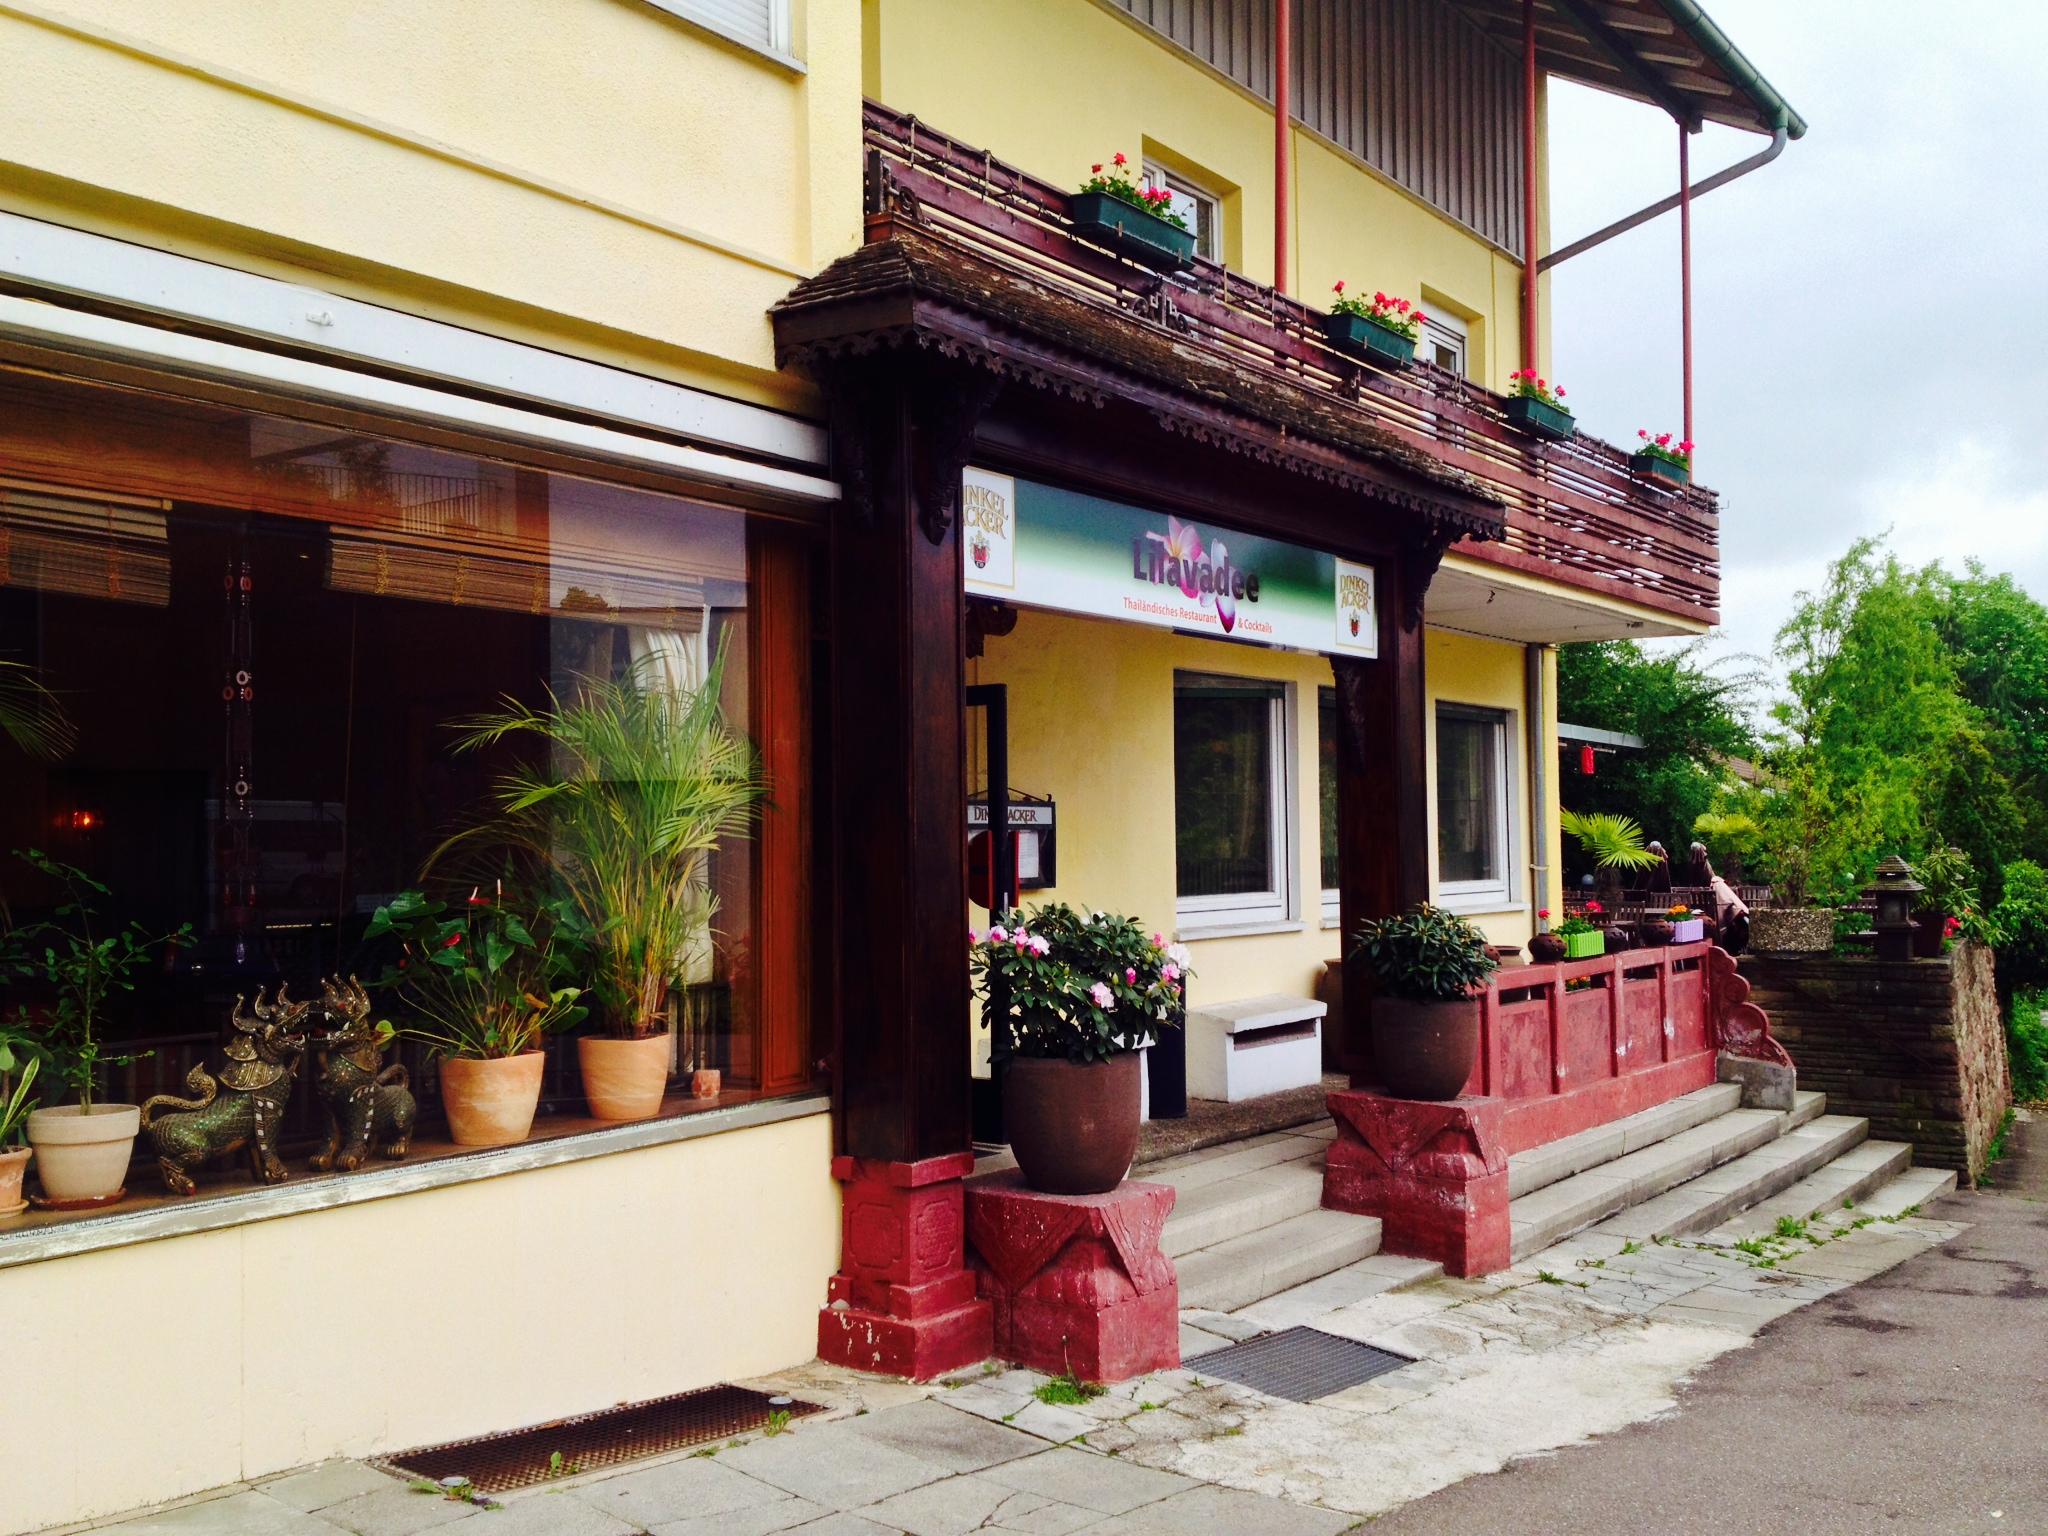 Lilavadee Thai Restaurant